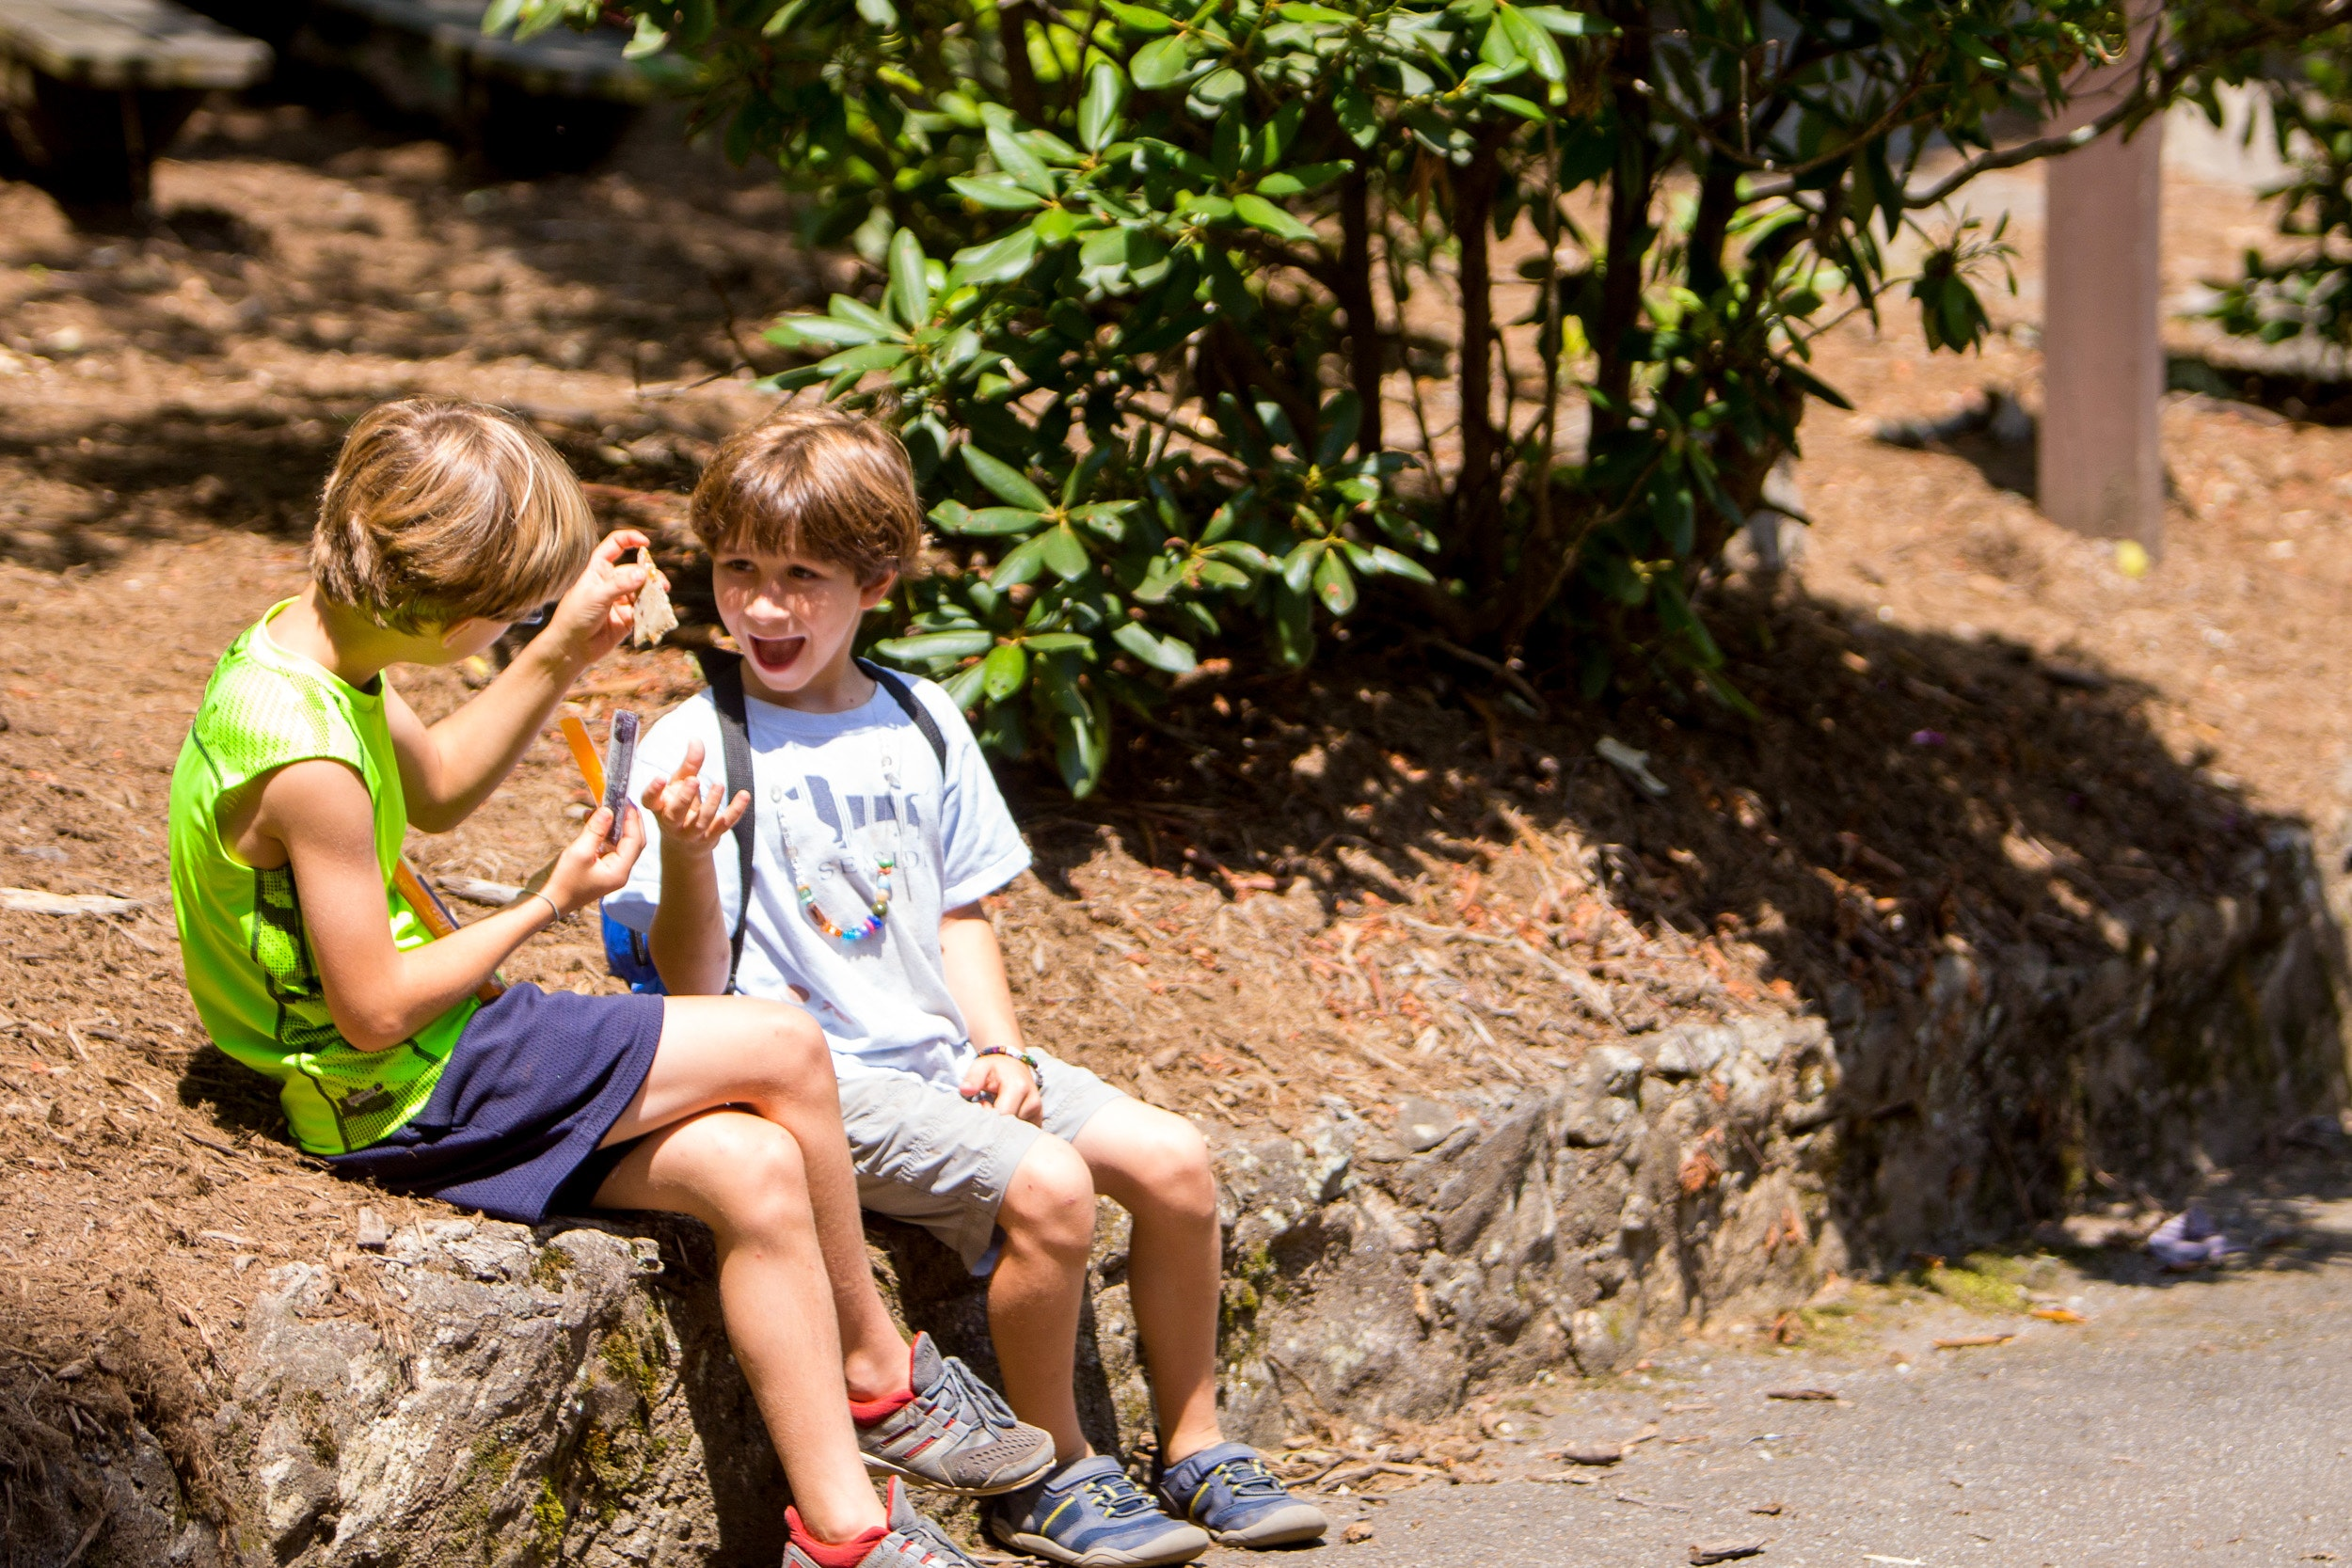 Parents during camp highlander coed summer camp in north carolina.jpg?ixlib=rails 2.1